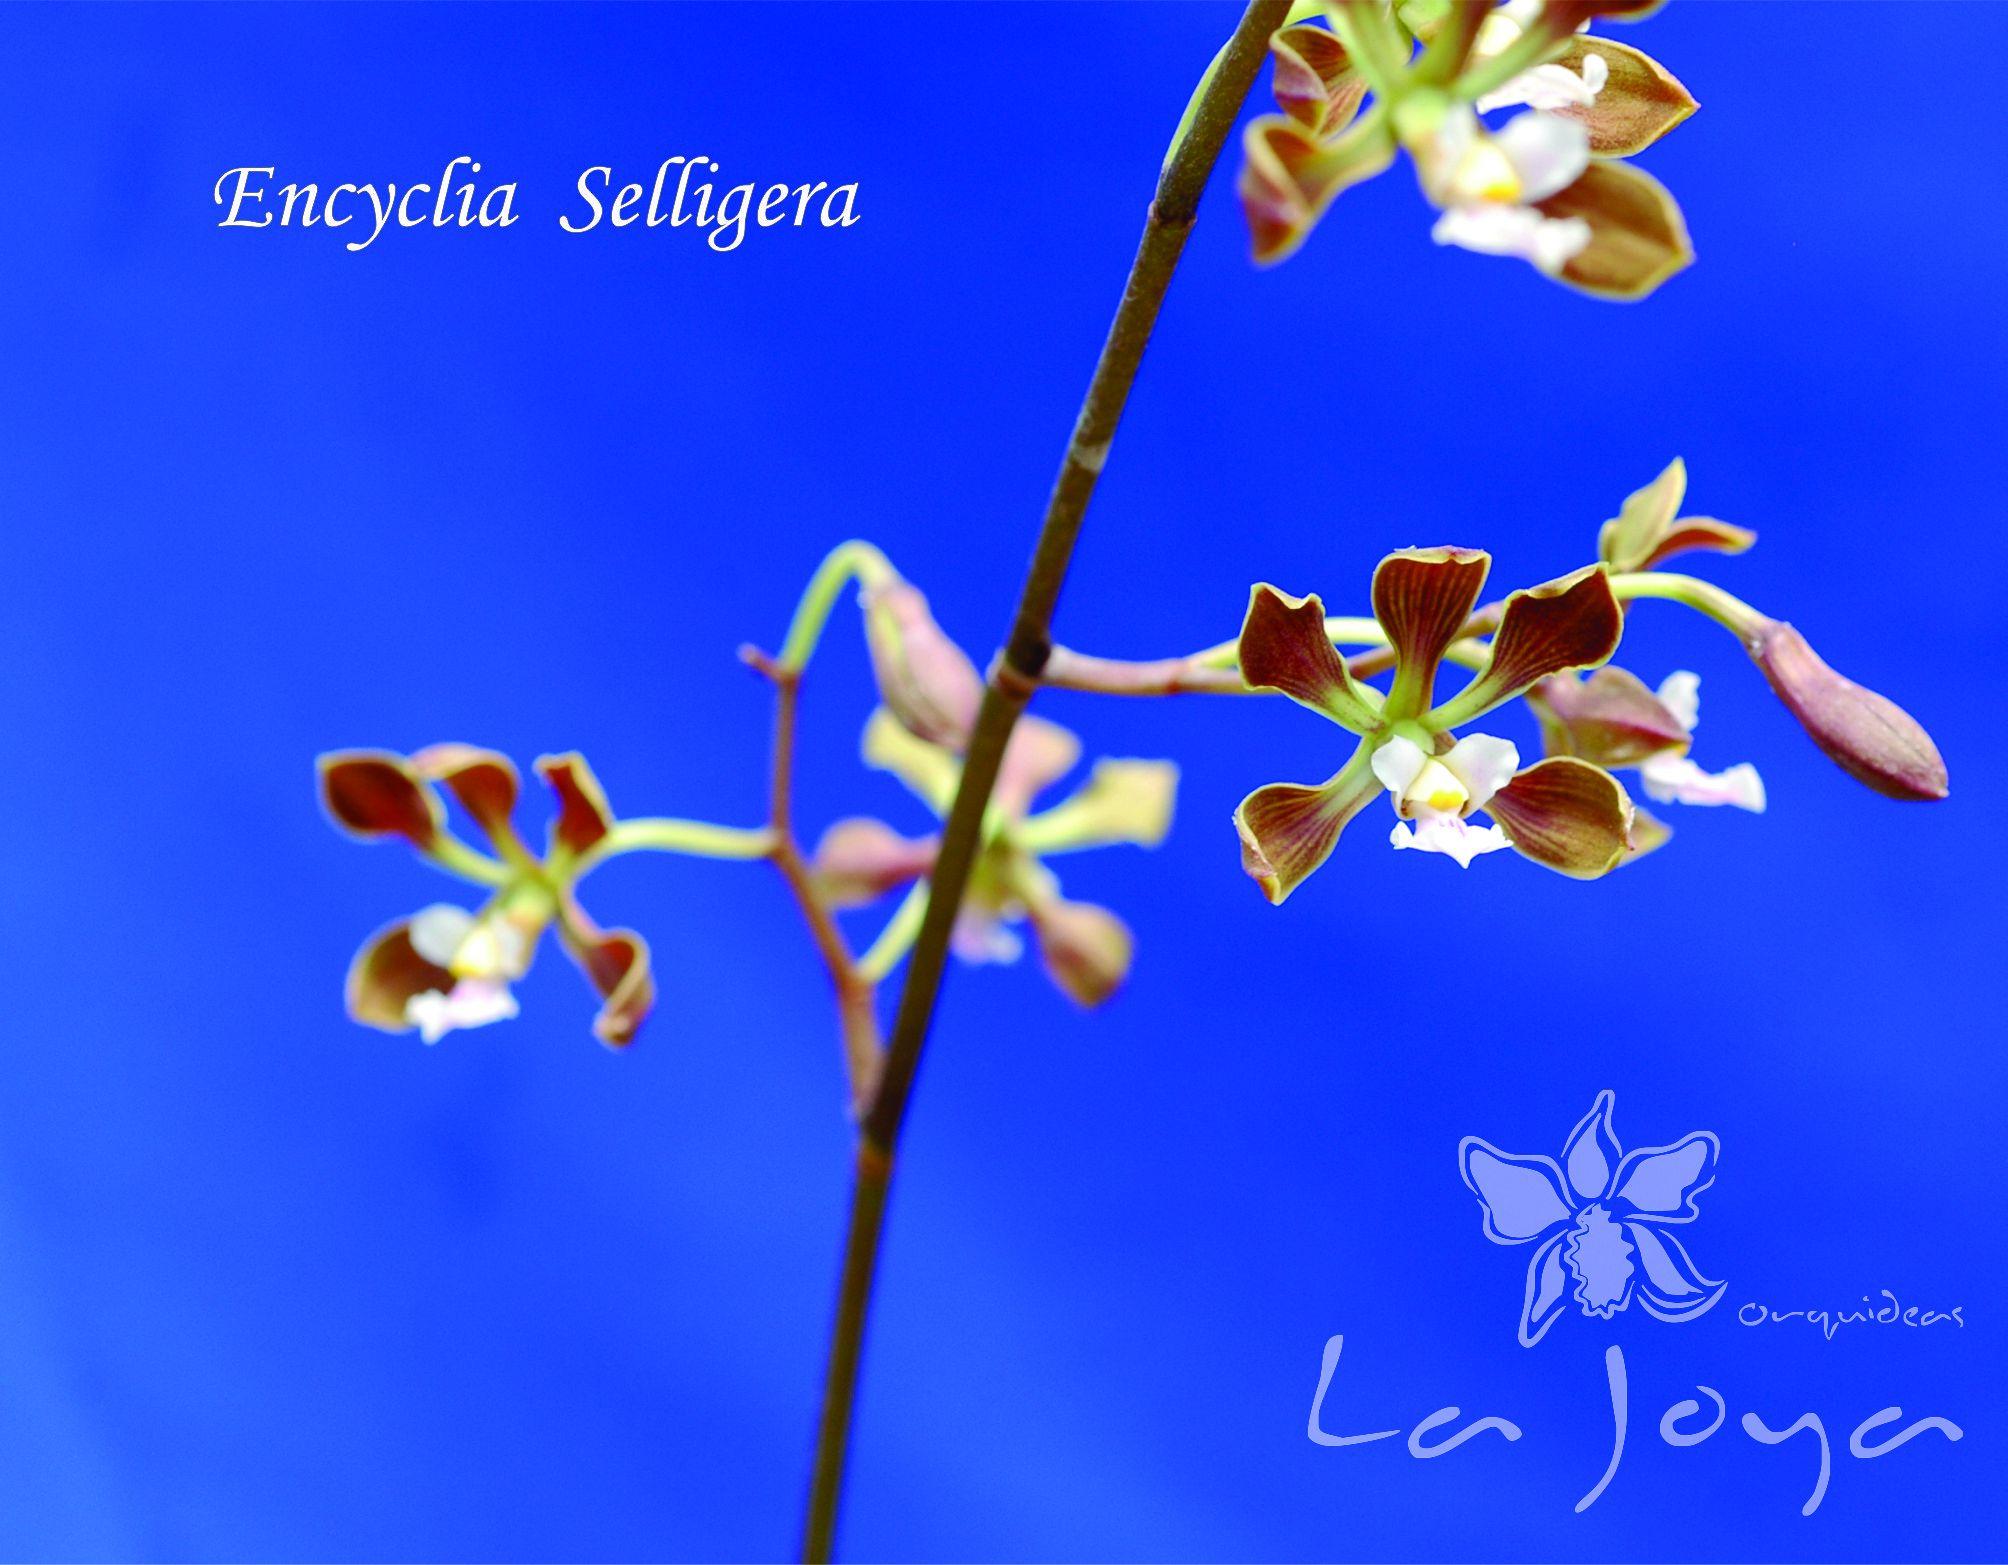 Encyclia Selligera